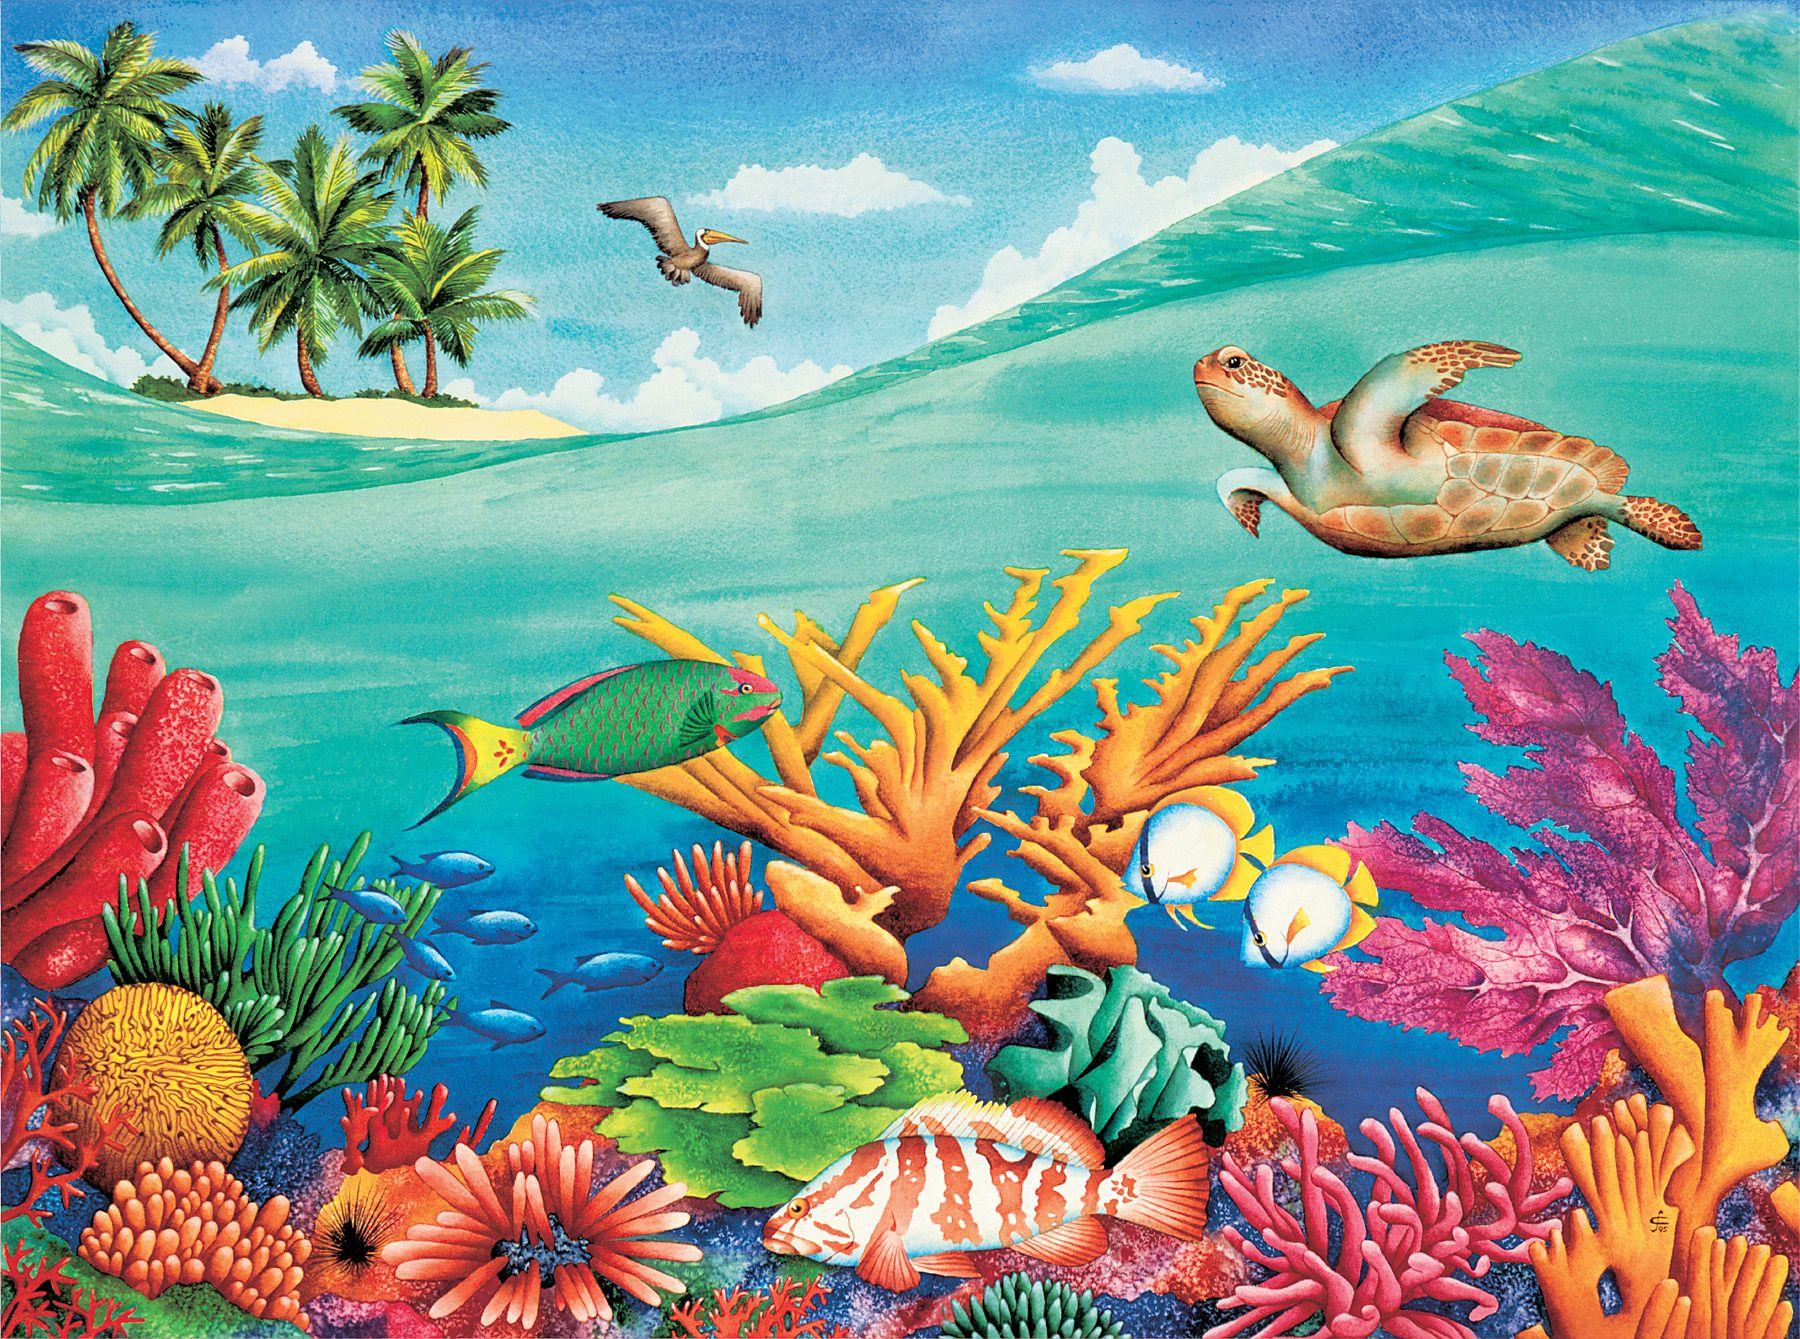 Under The Sea Wall Mural At Wwwsurferbeddingcom